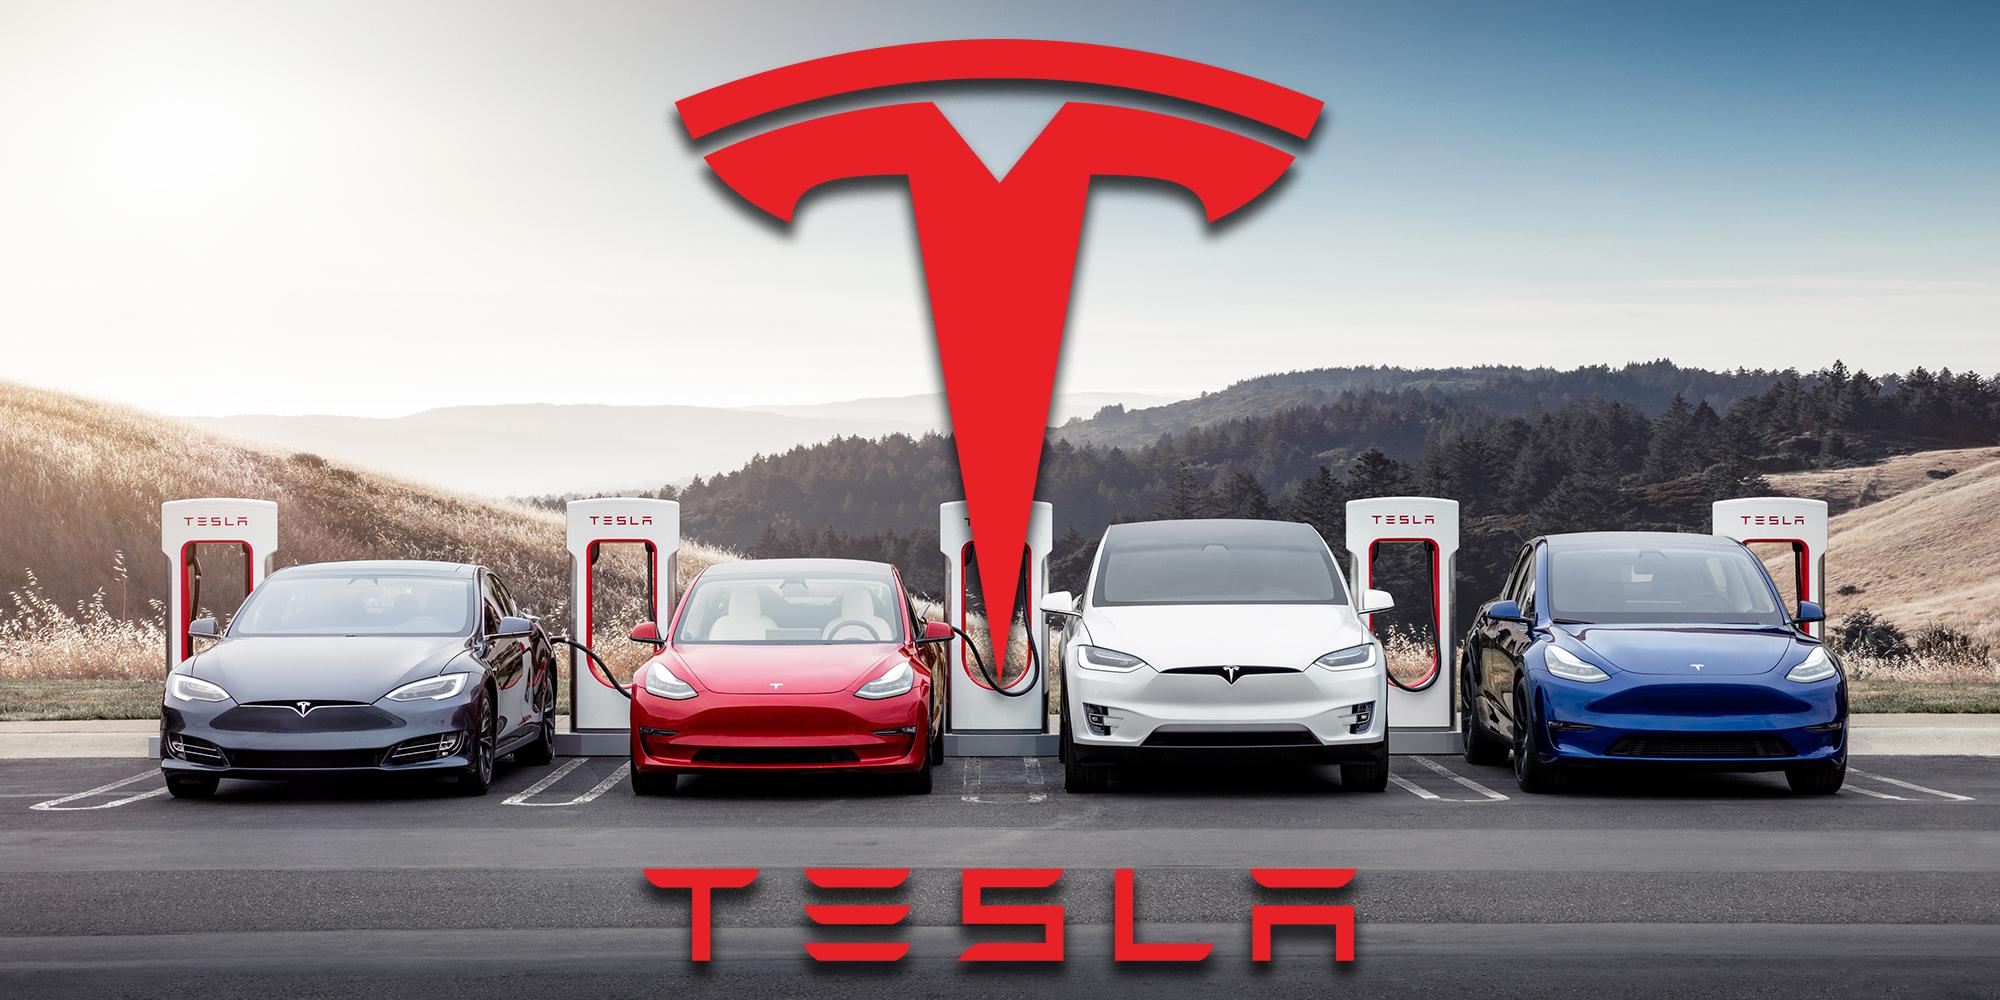 Tesla 3Q earnings top estimates after deliveries set record high